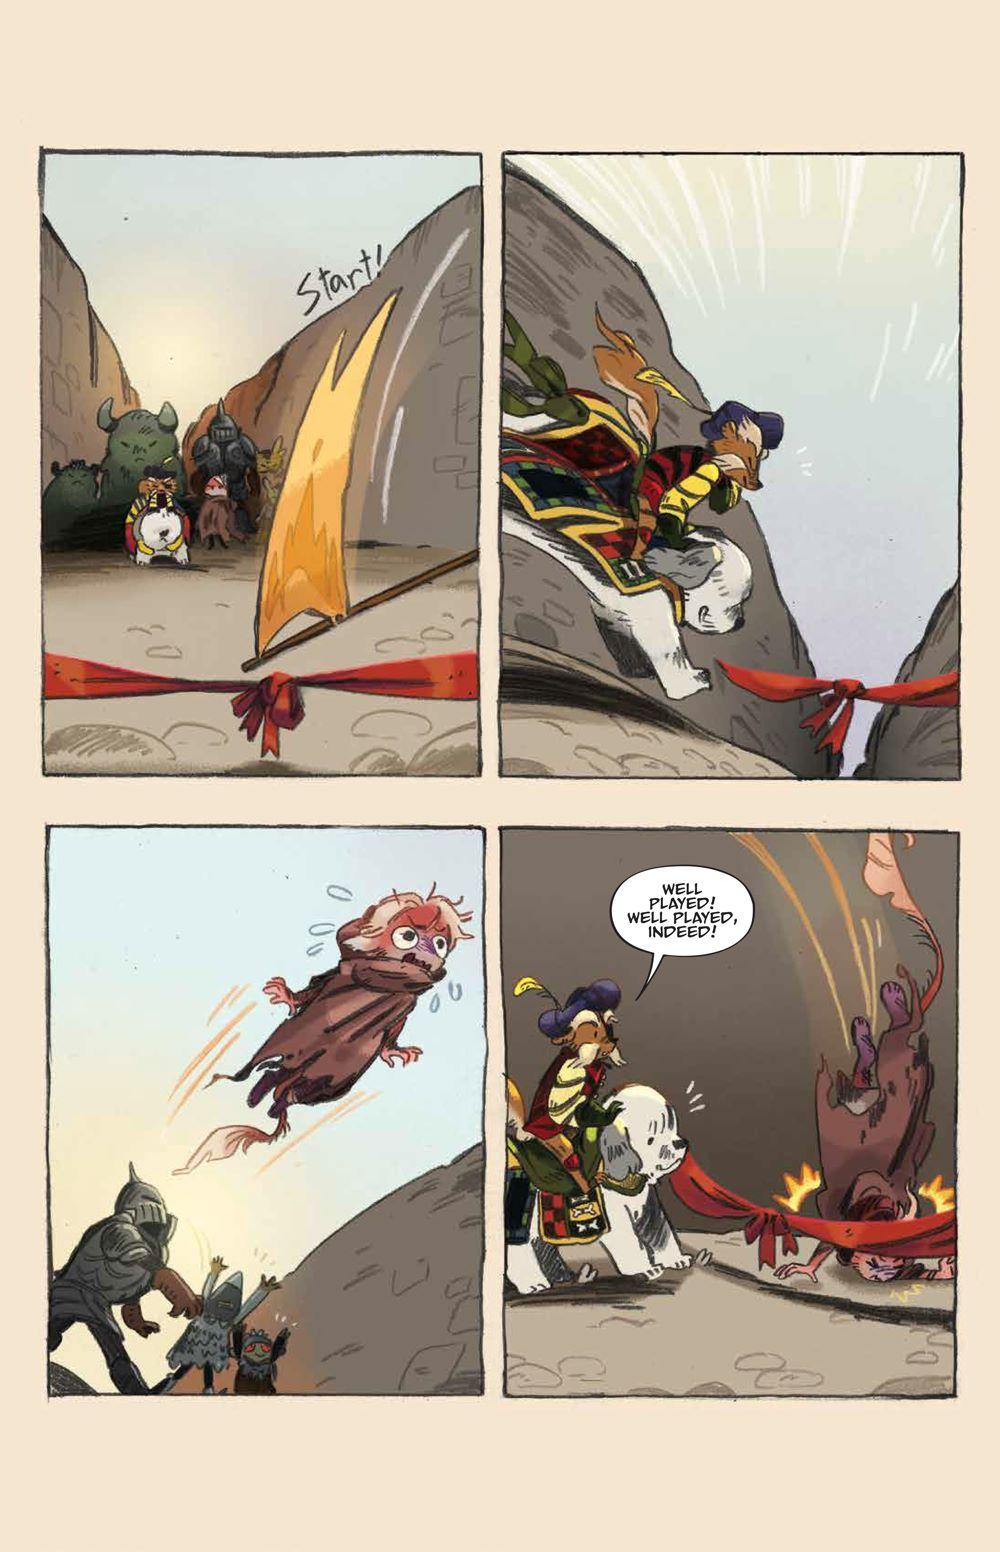 Labyrinth_UnderSpell_HC_PRESS_21 ComicList Previews: JIM HENSON'S LABYRINTH UNDER THE SPELL HC